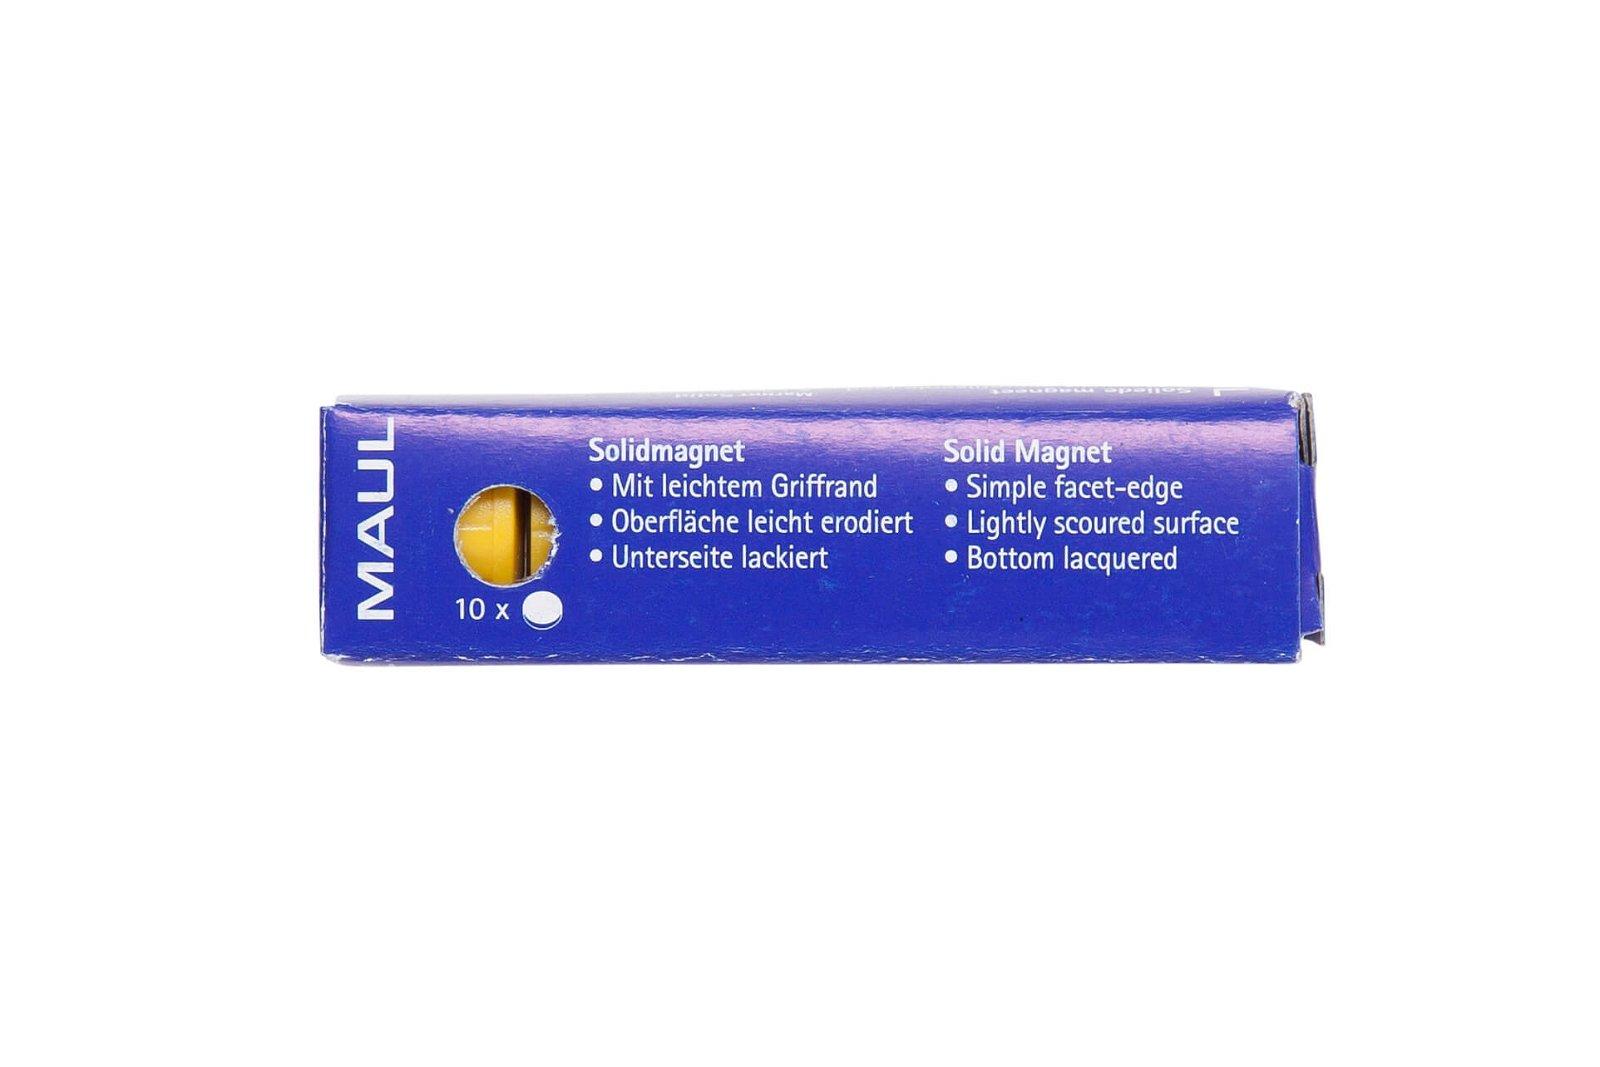 Magnet MAULsolid